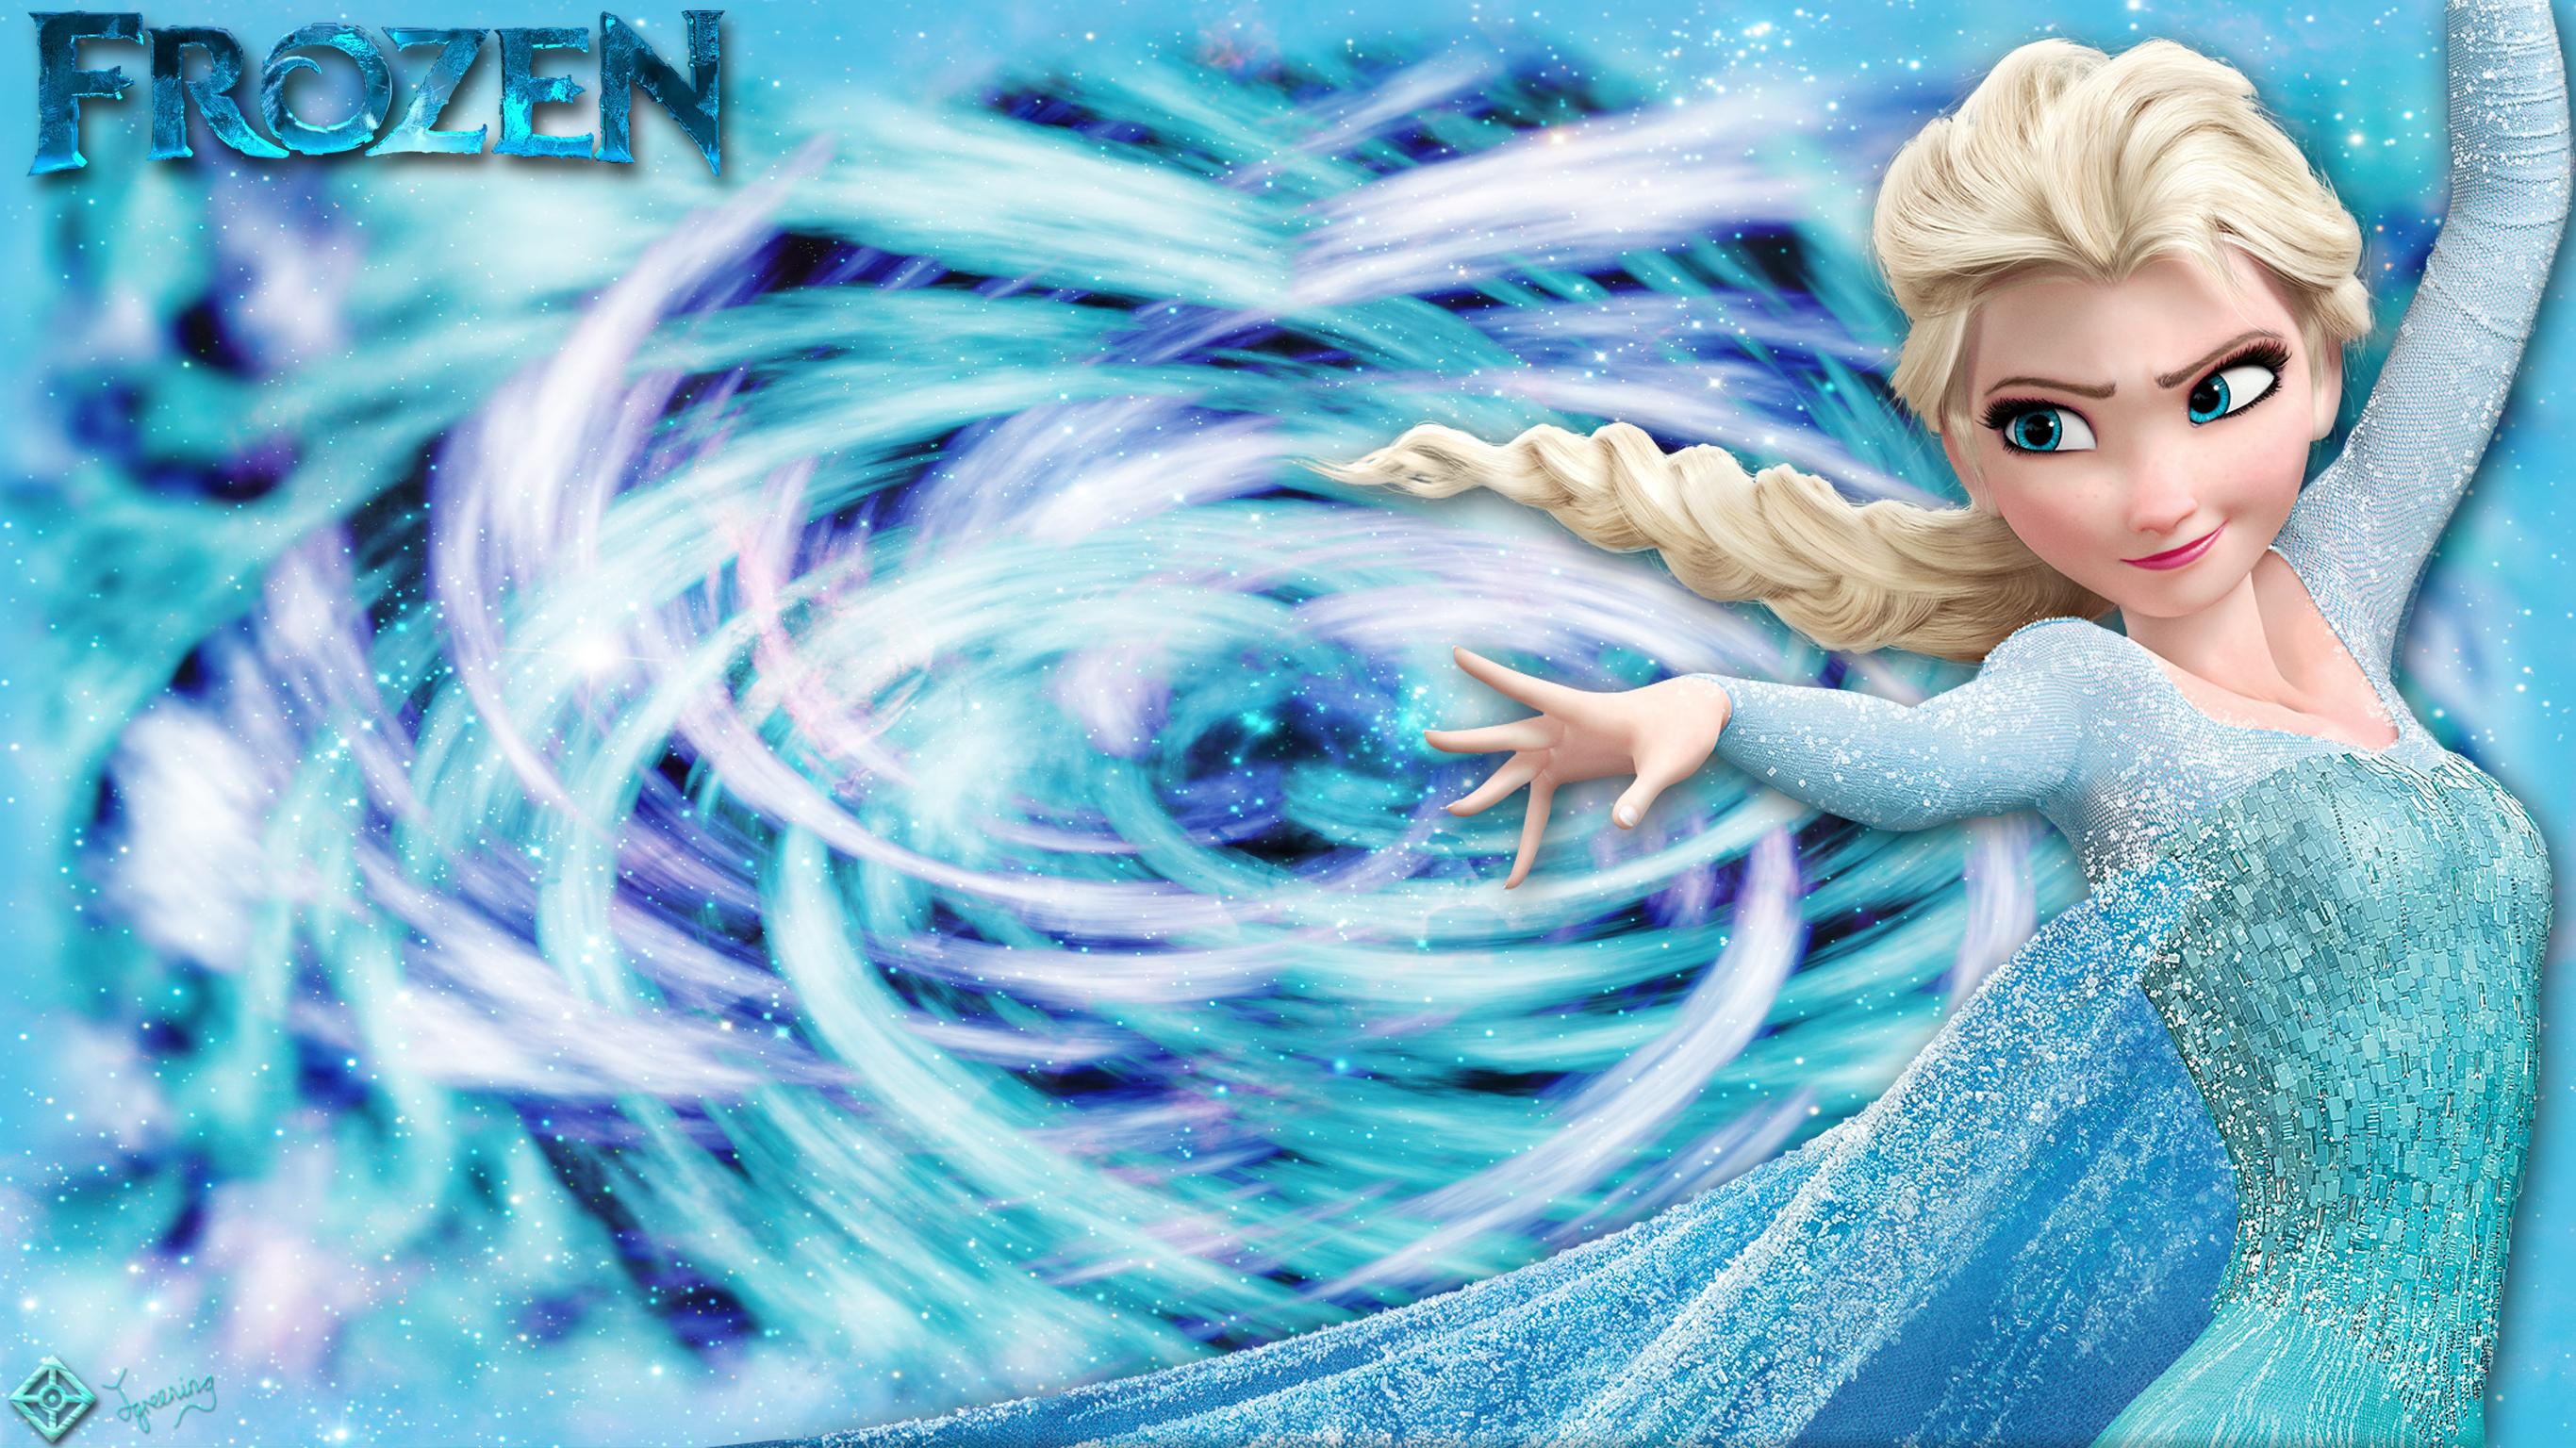 Frozen wallpaper 18